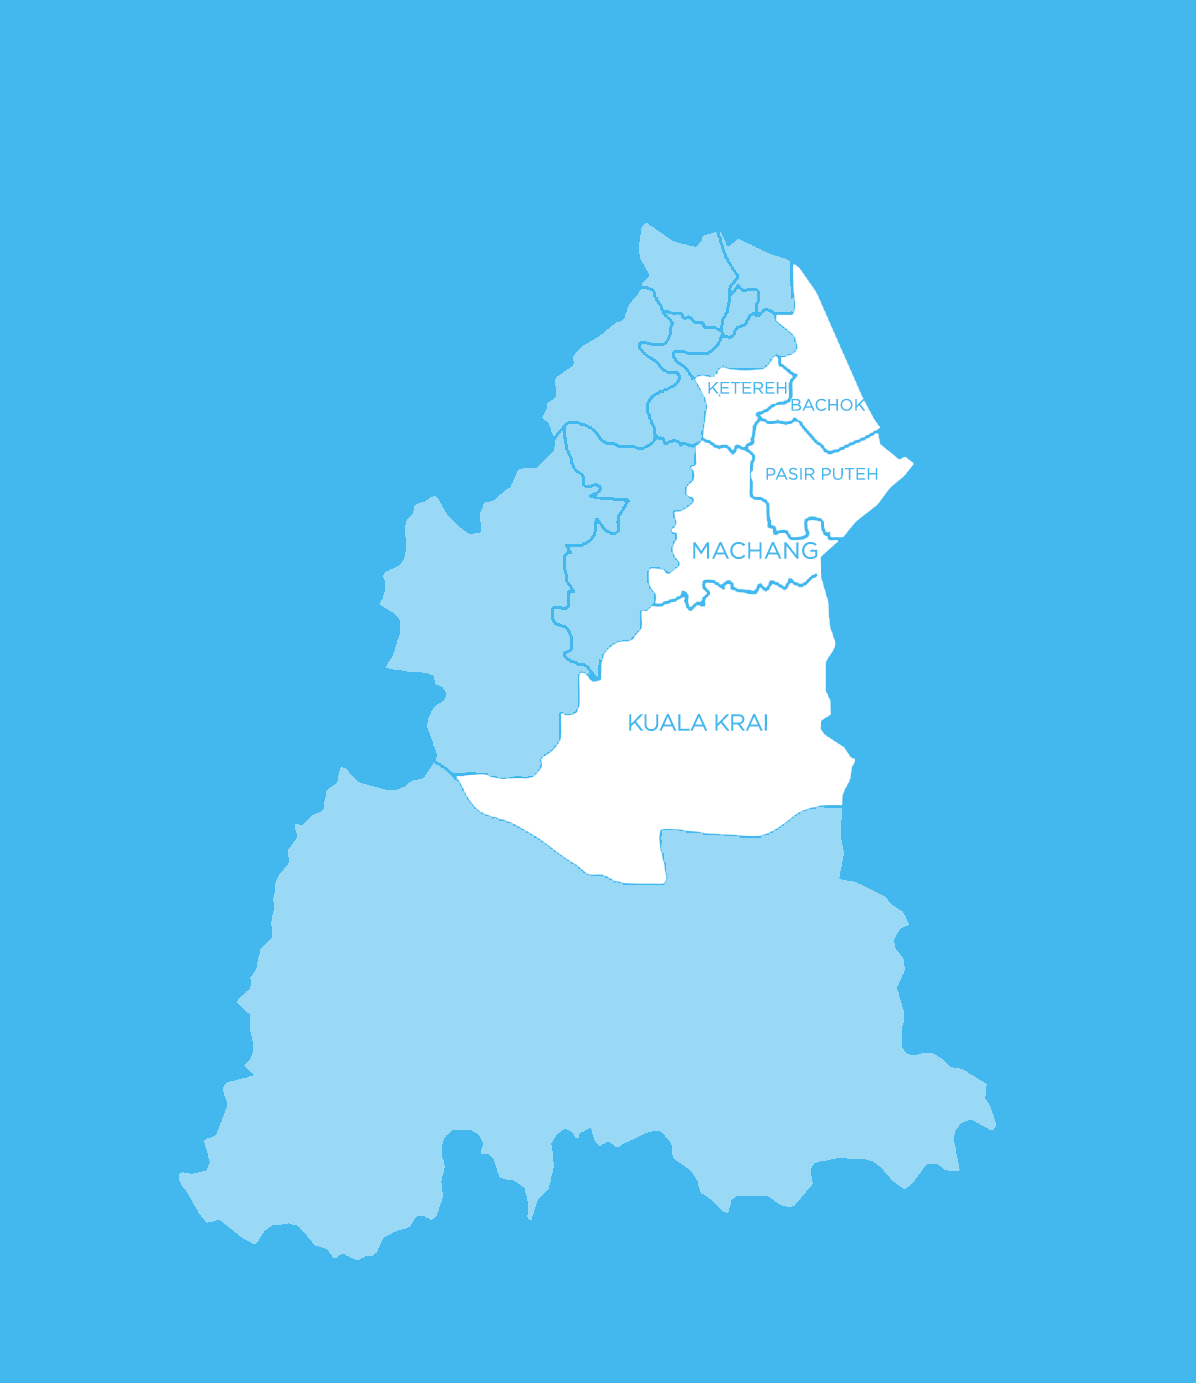 Koridor Pantai Timur : Kelantan